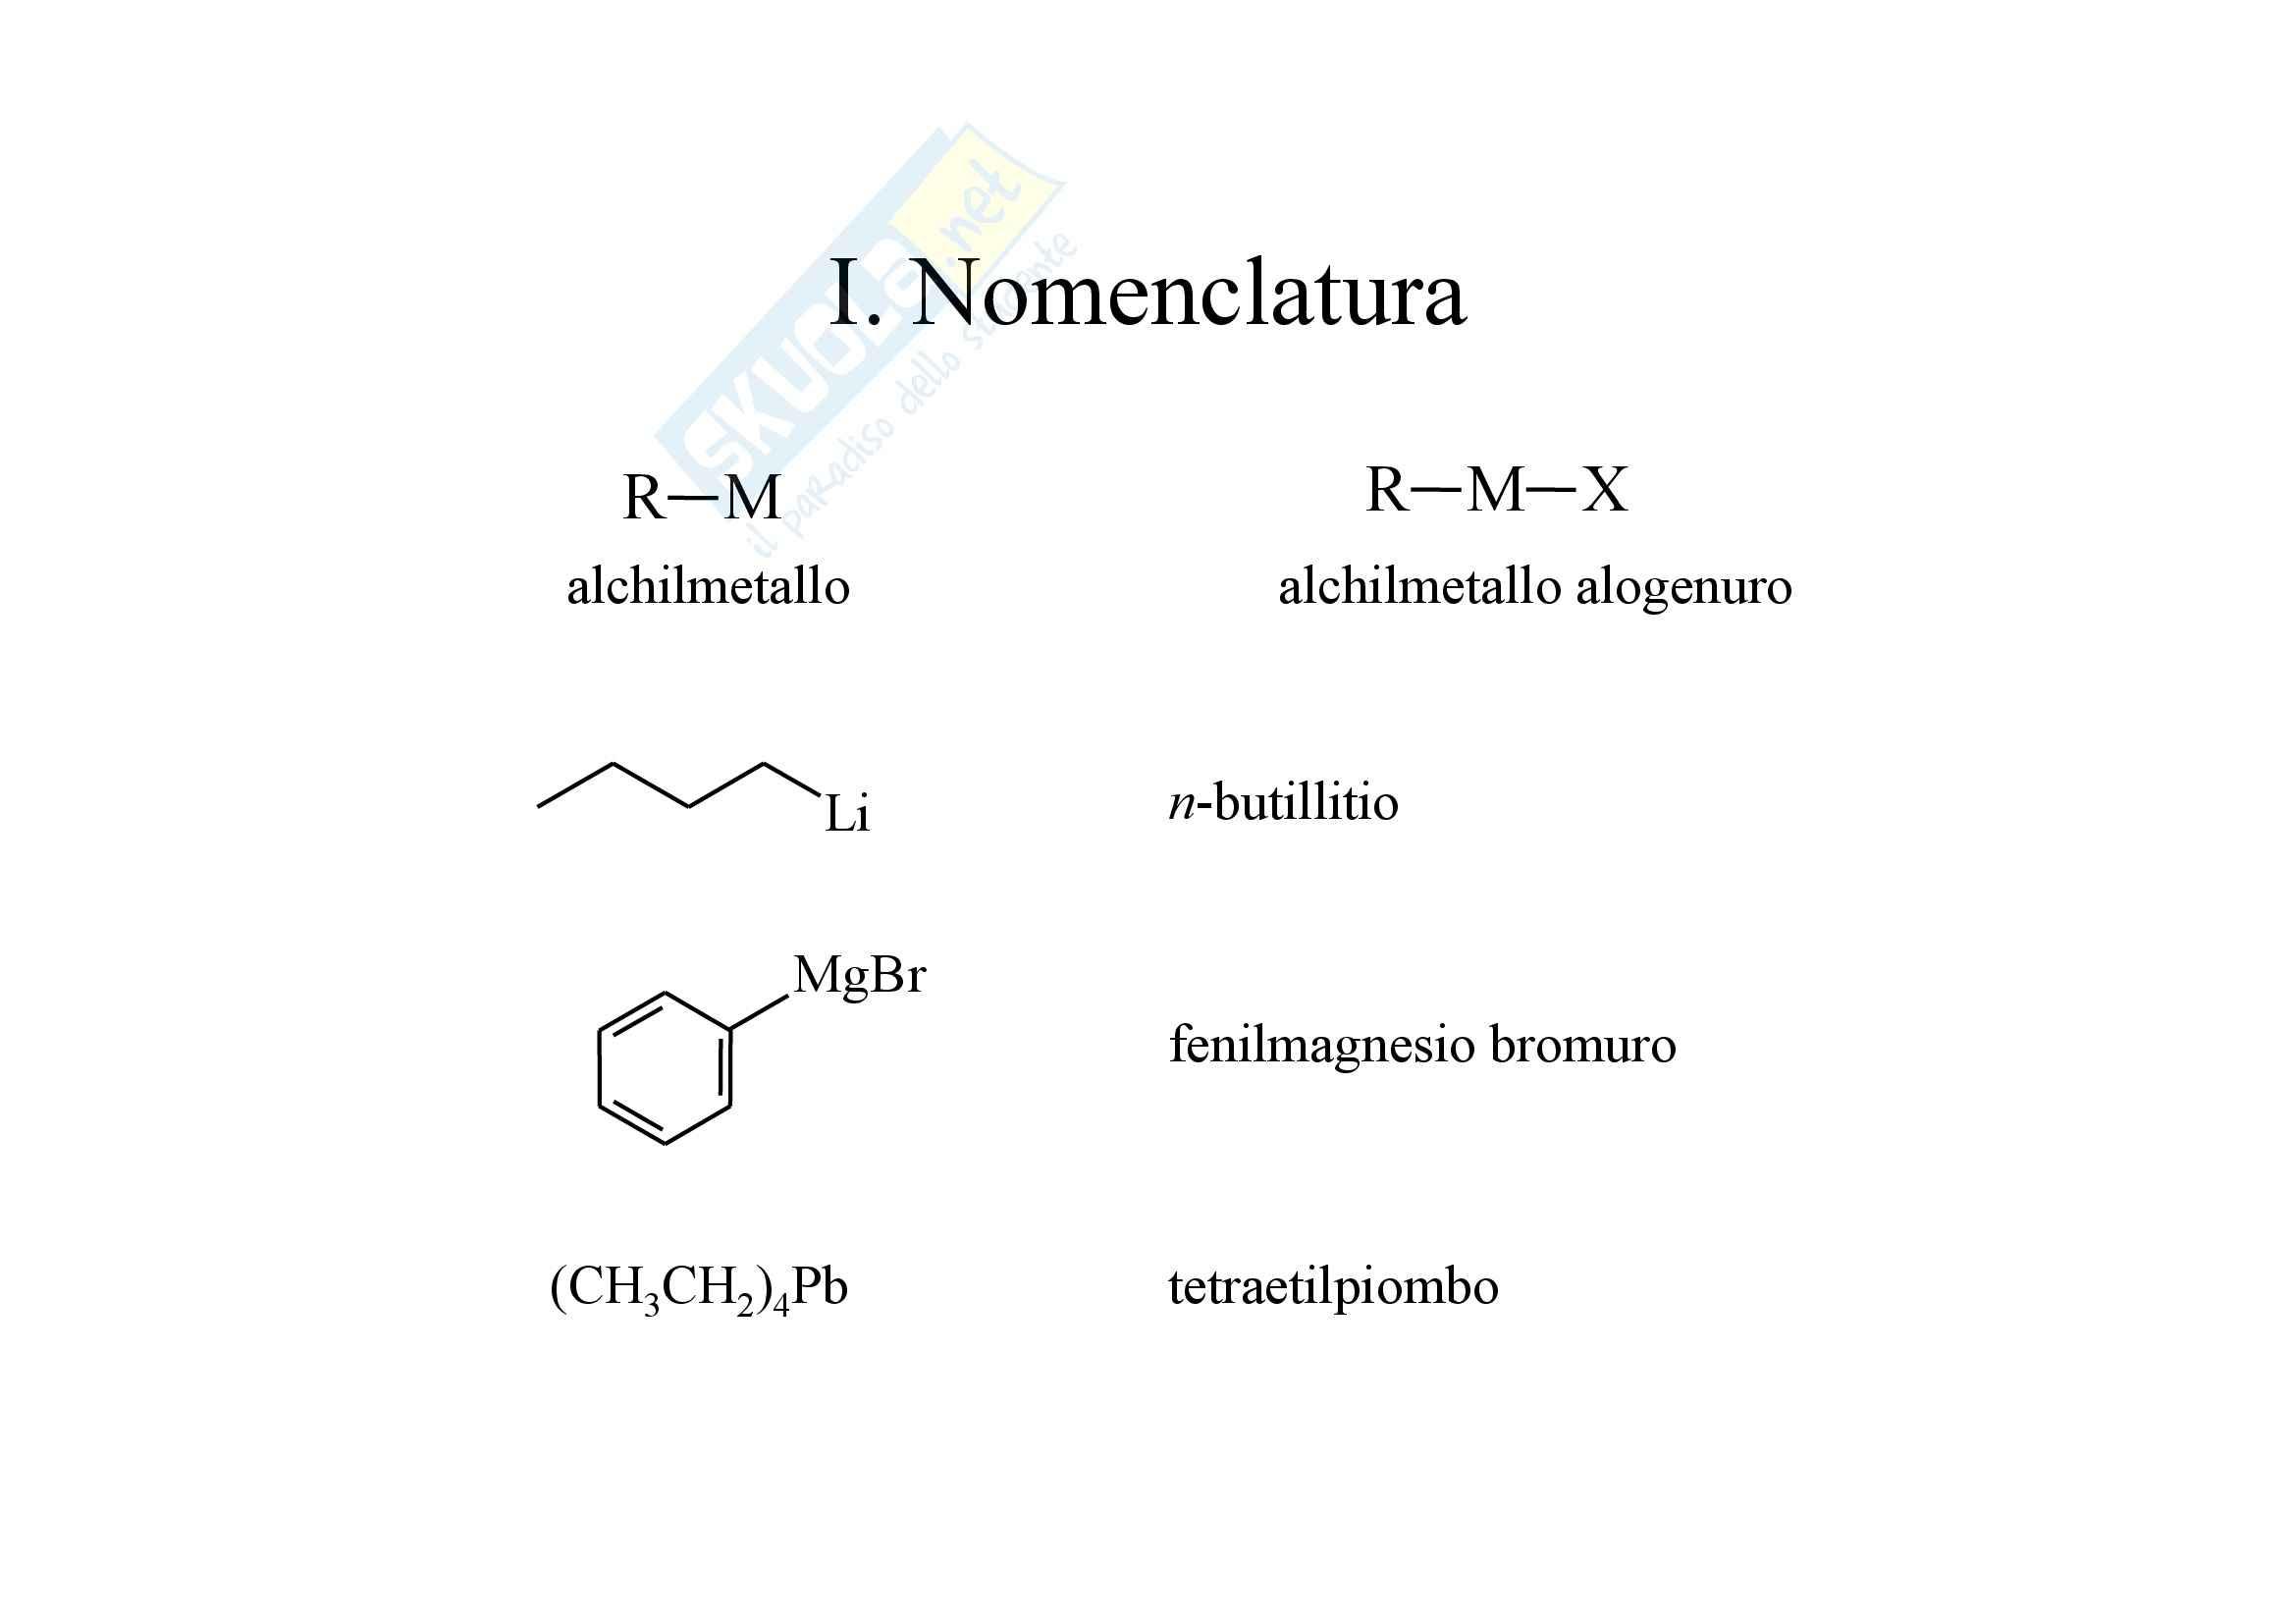 Chimica organica - composti organometallici Pag. 2